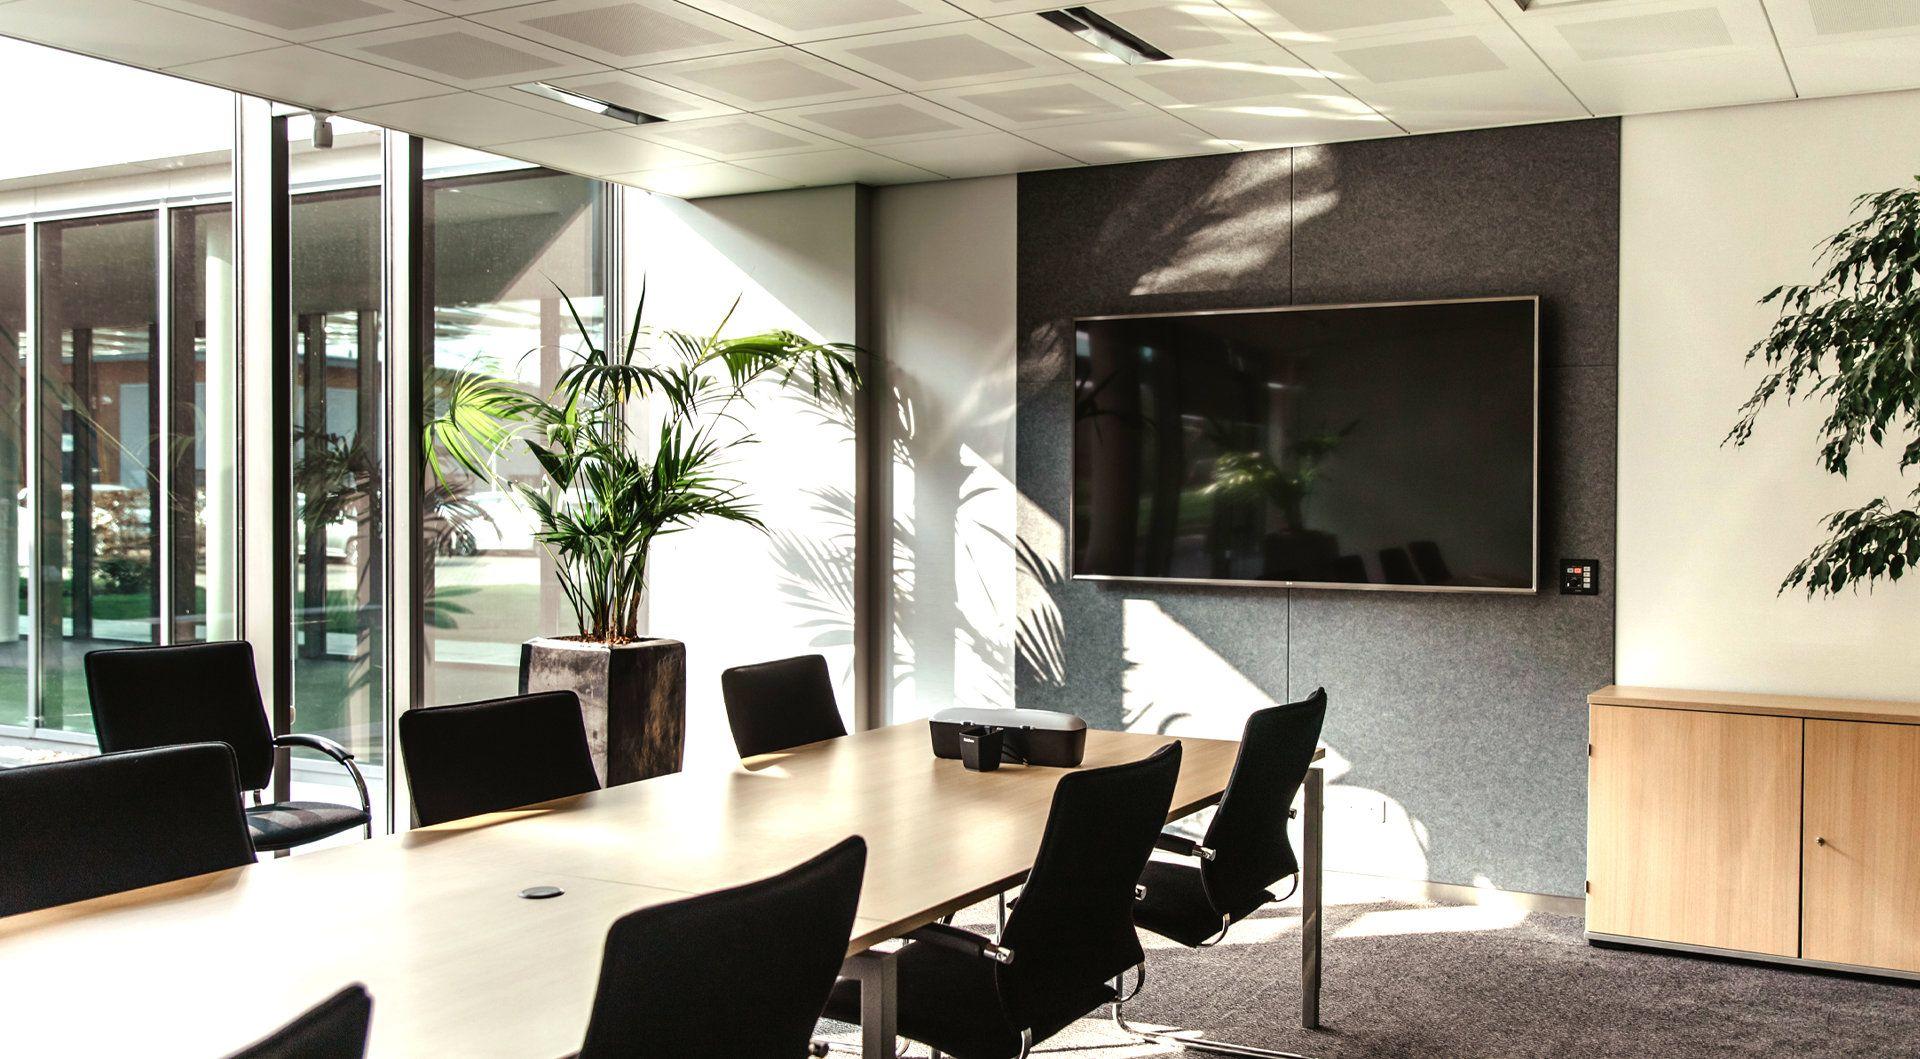 "Benq BH3801D 96,5 cm (38"") LED Digitale signage flatscreen Zwart - Case studie de vries"